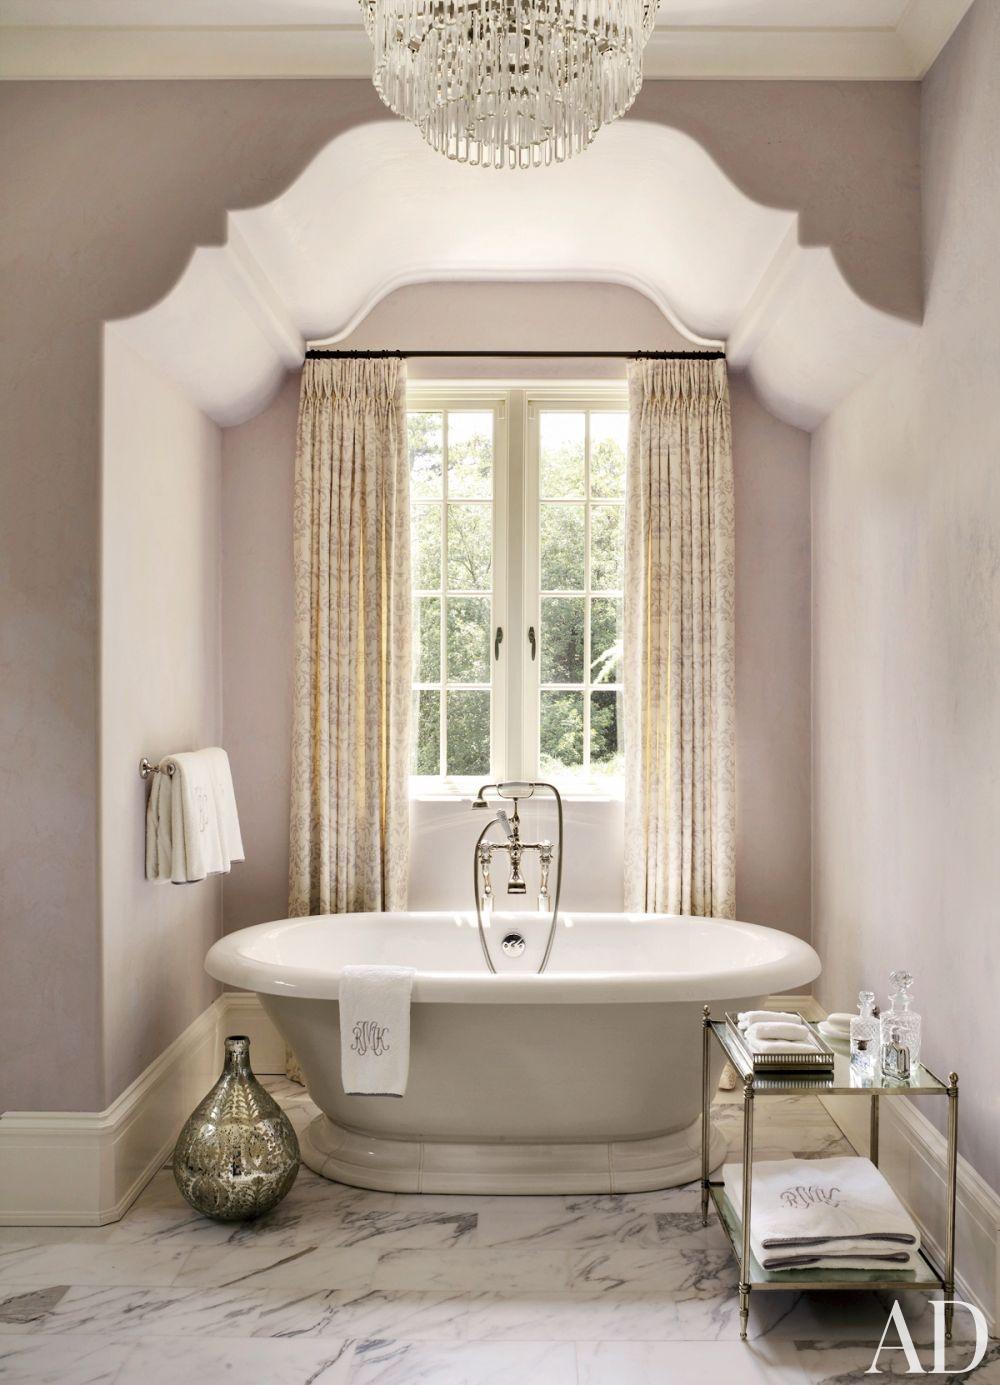 Traditional Bathroom Suzanne Kasler Interiors Atlanta Georgia 201307_1000